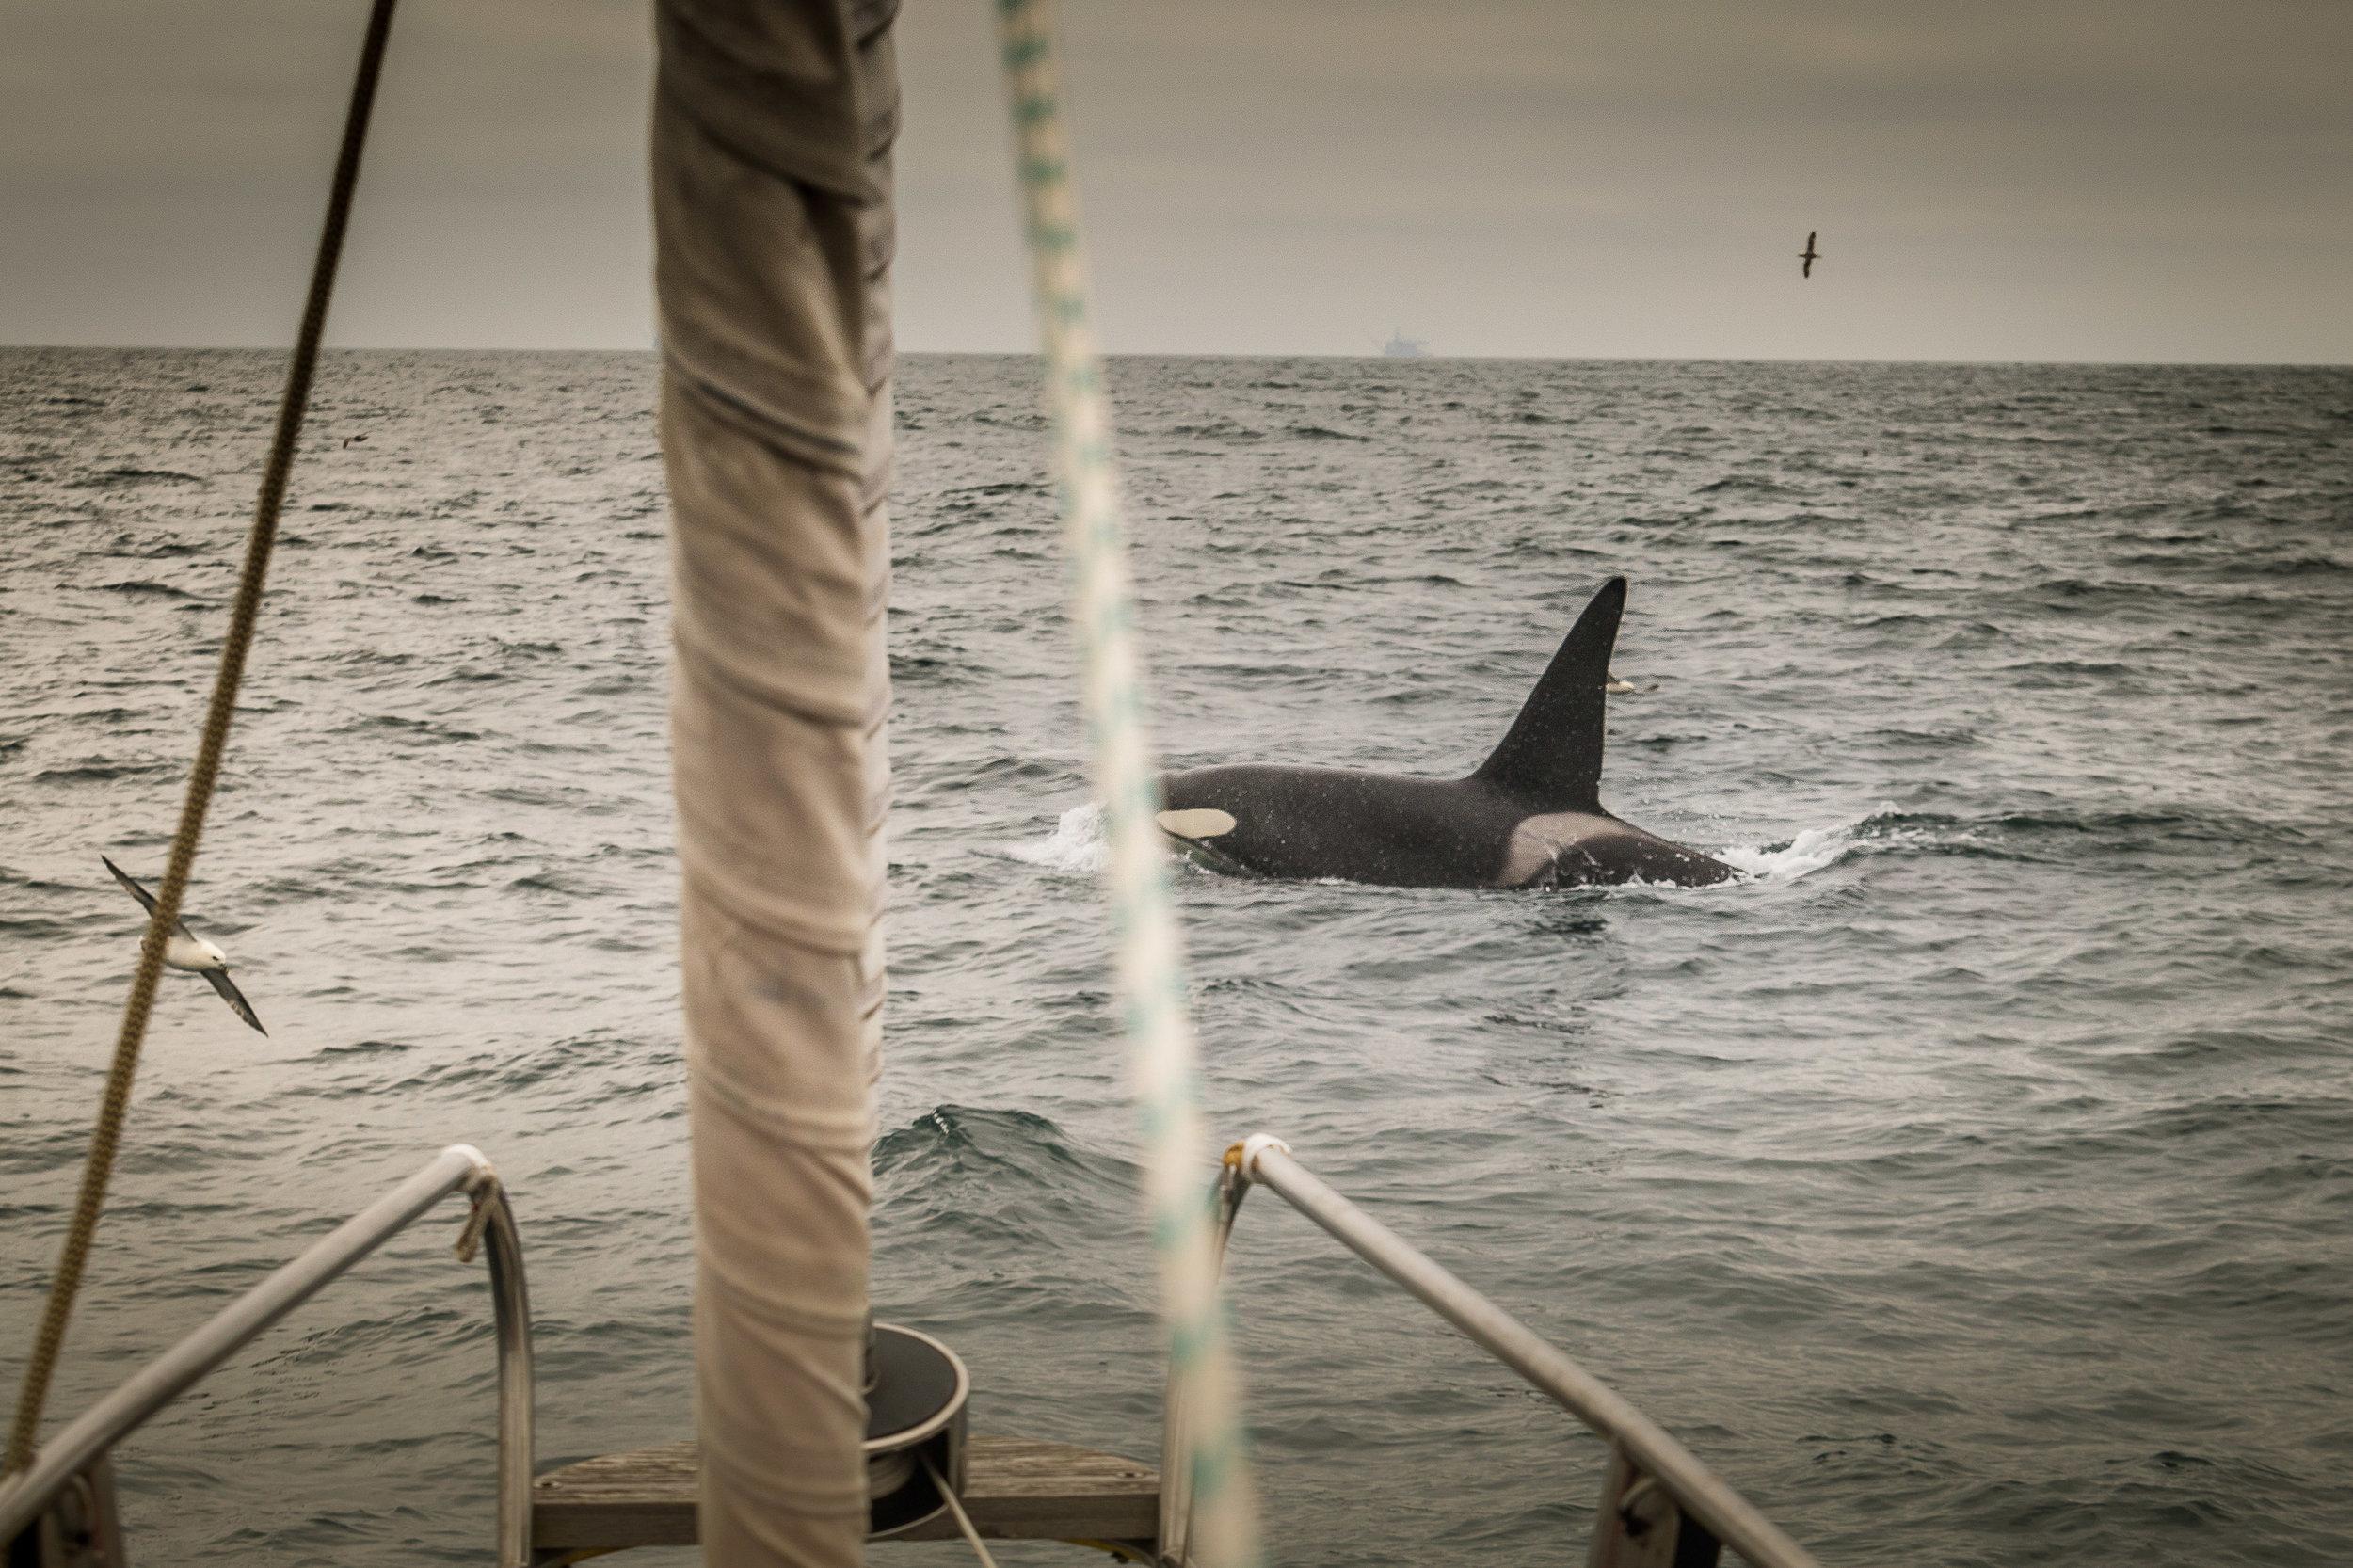 Orca sighting during marine mammal surveying